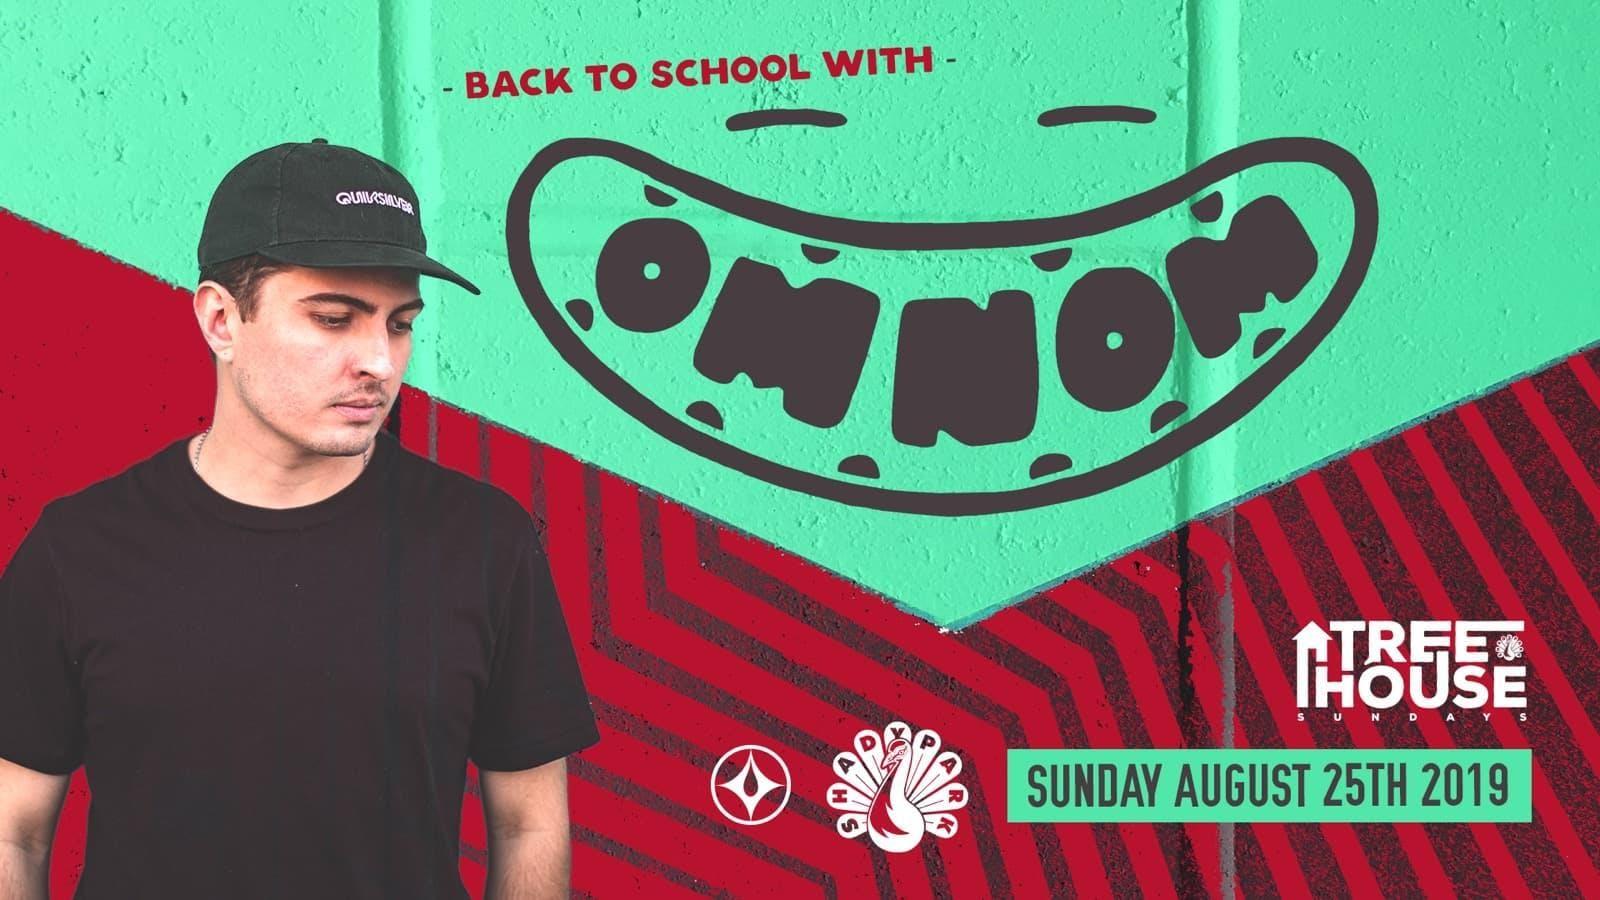 Omnom at TreeHouse Sunday